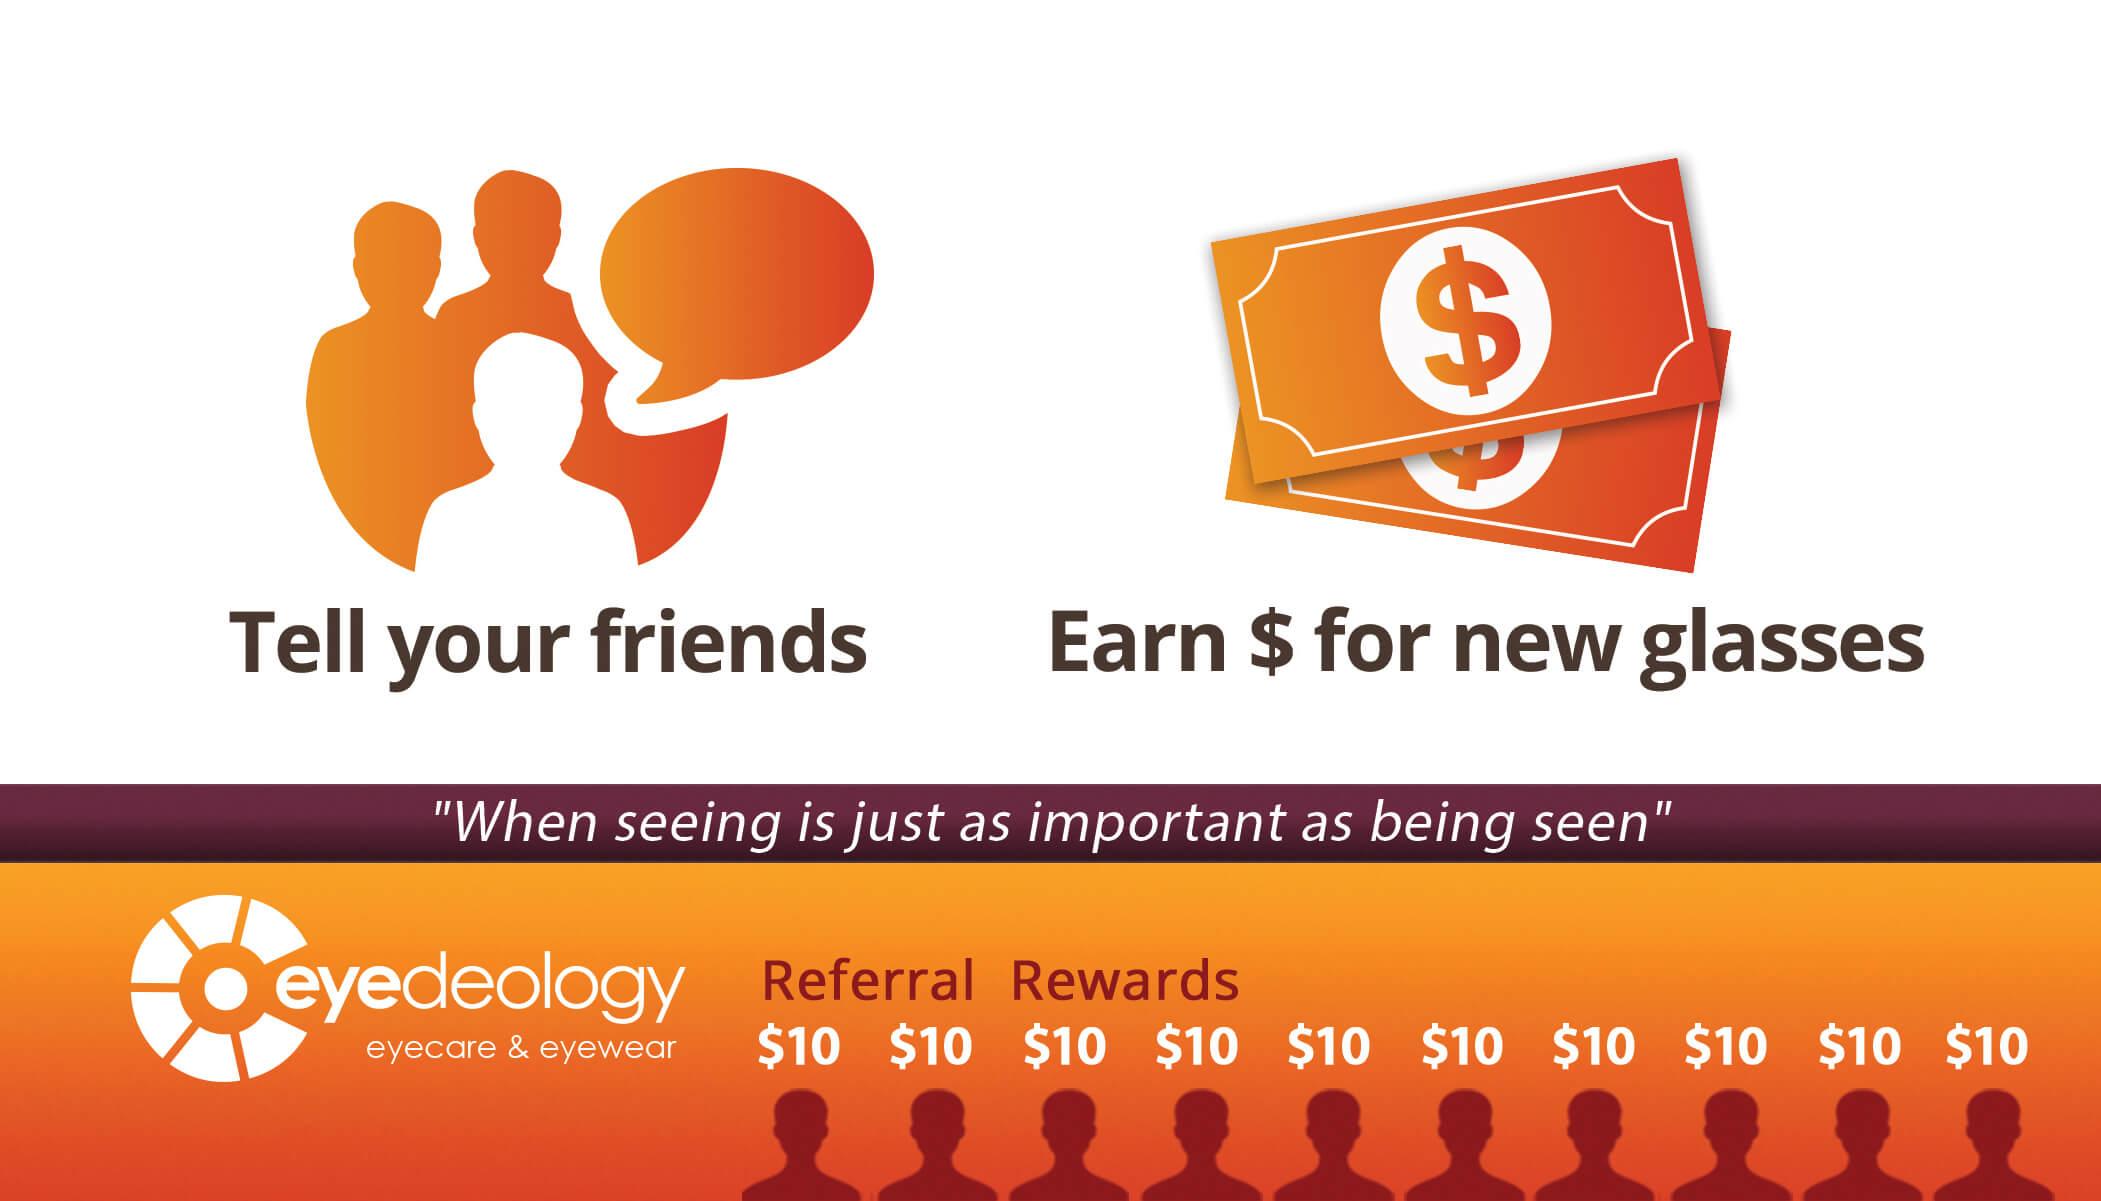 eyedeology referral rewards